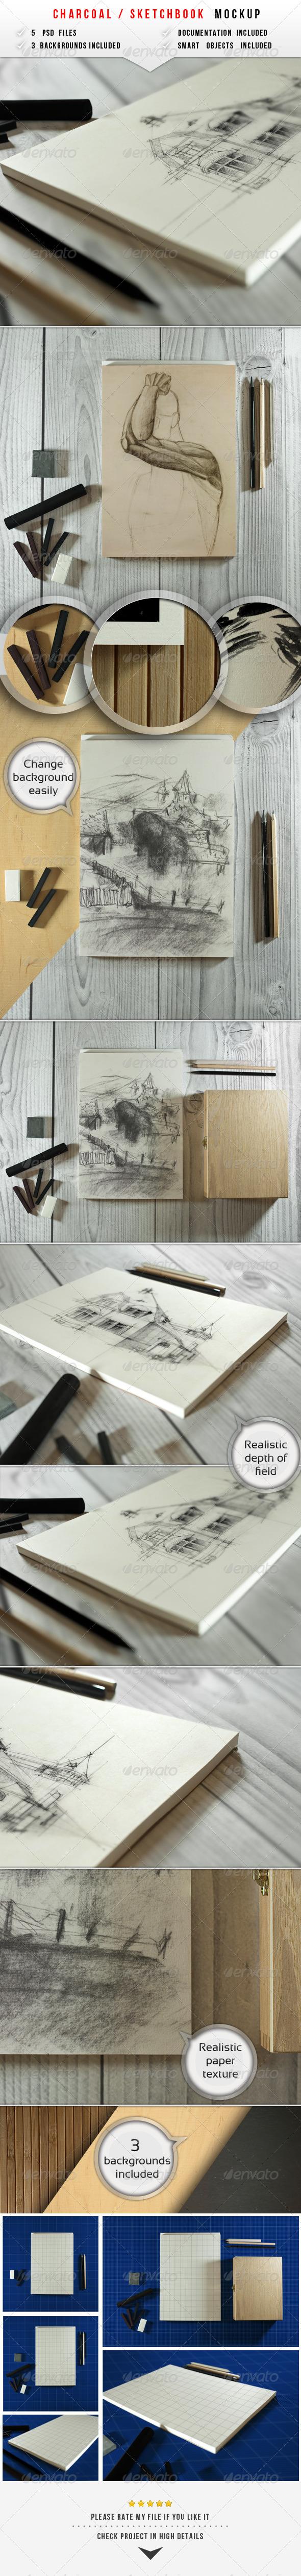 GraphicRiver Sketch & Charcoal Mockup 6285849